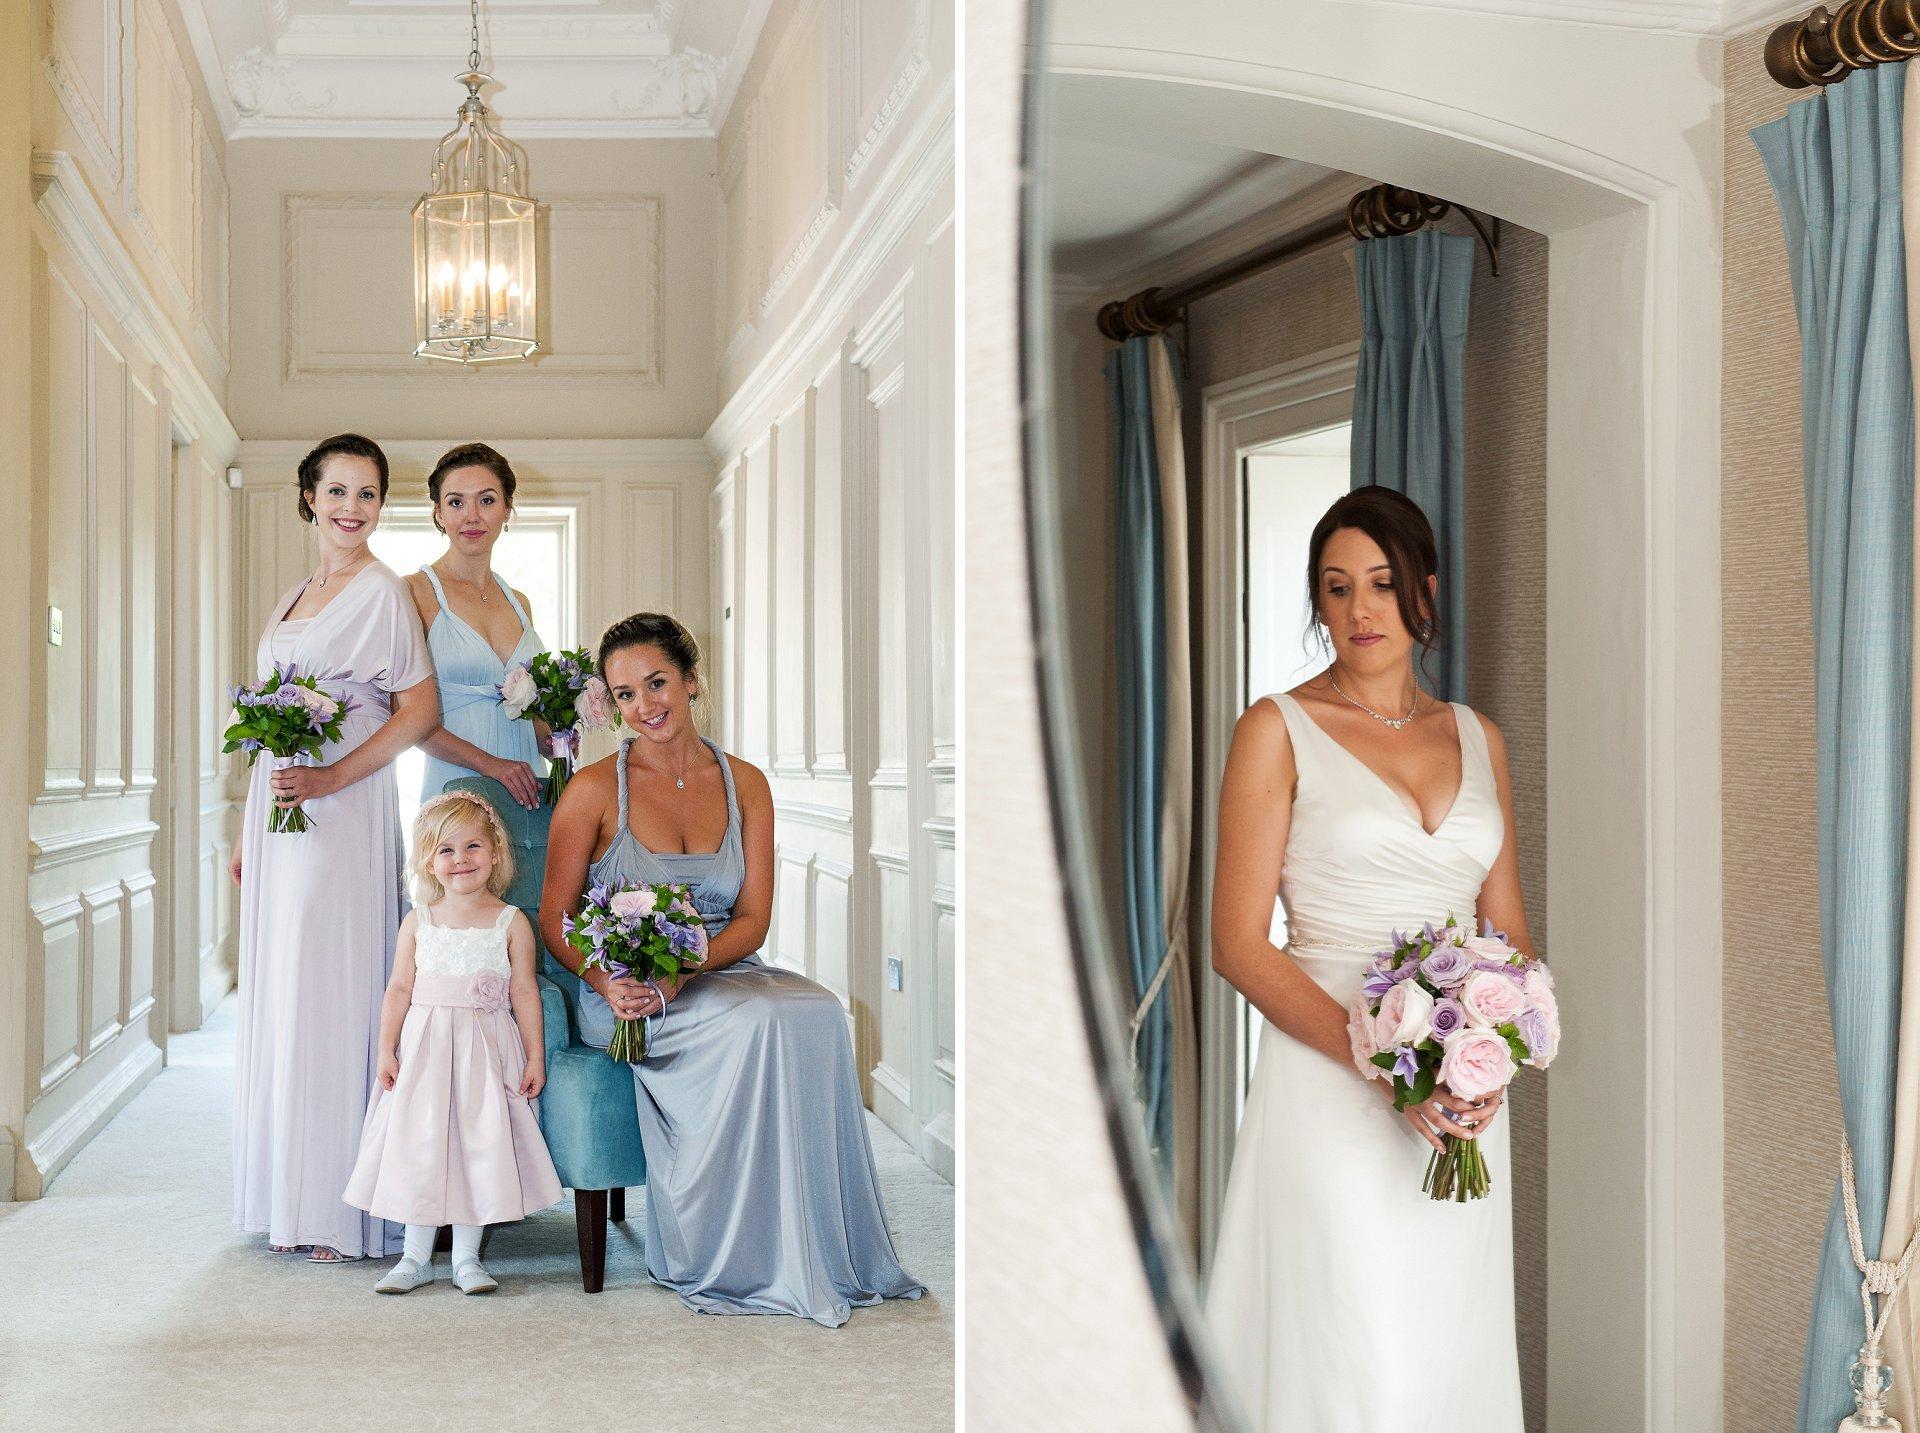 Bride and bridesmaids ready at Morden Hall, a spectacular south London wedding venue